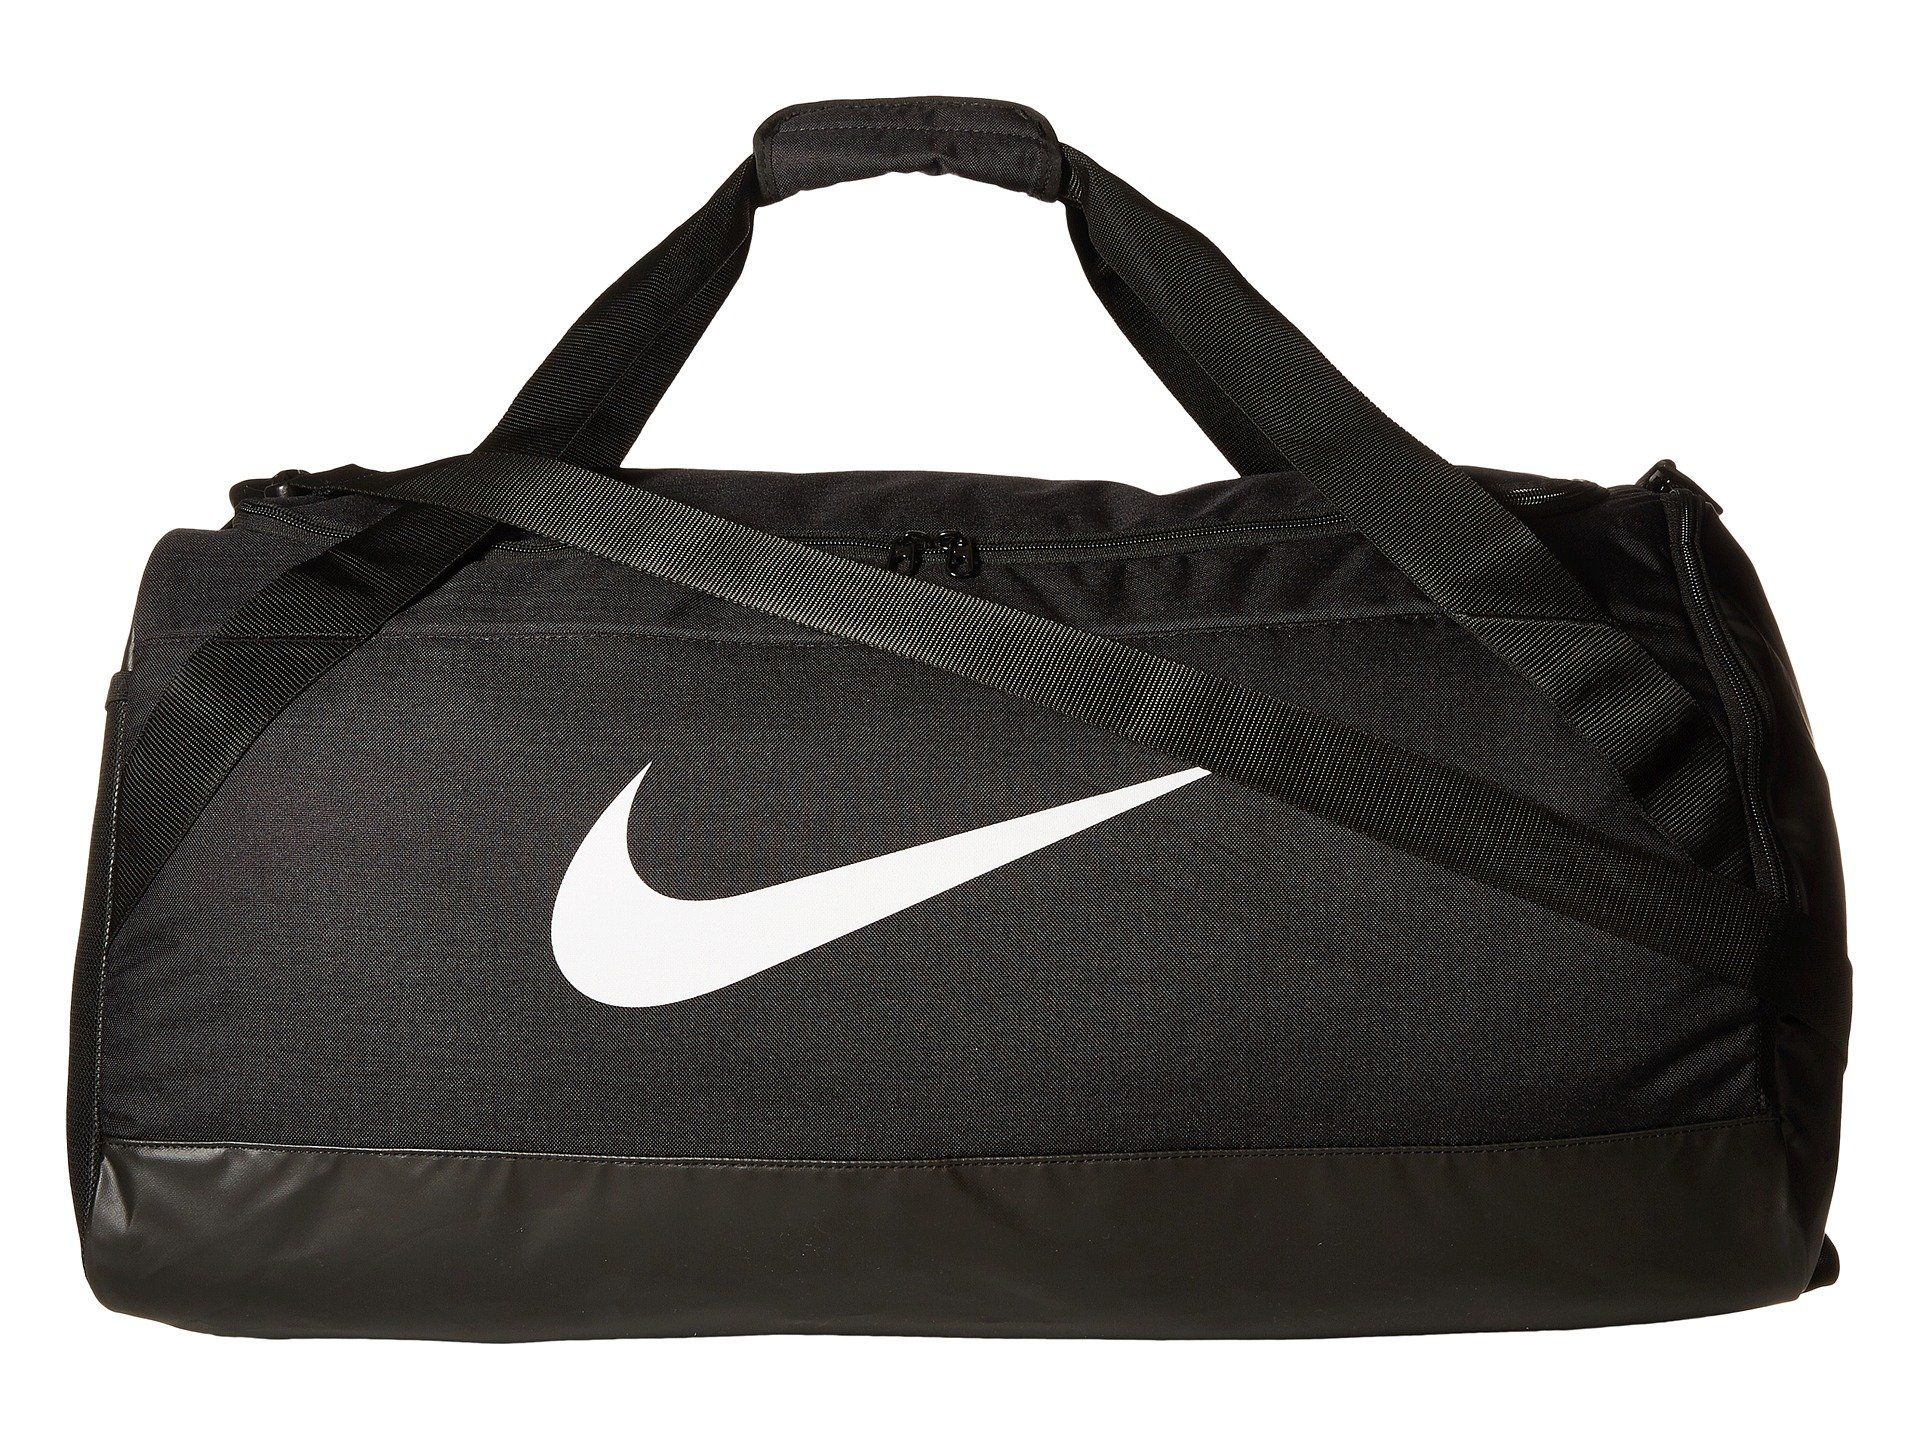 Duffel black Bag Nike Large white Black Brasilia cvWETp